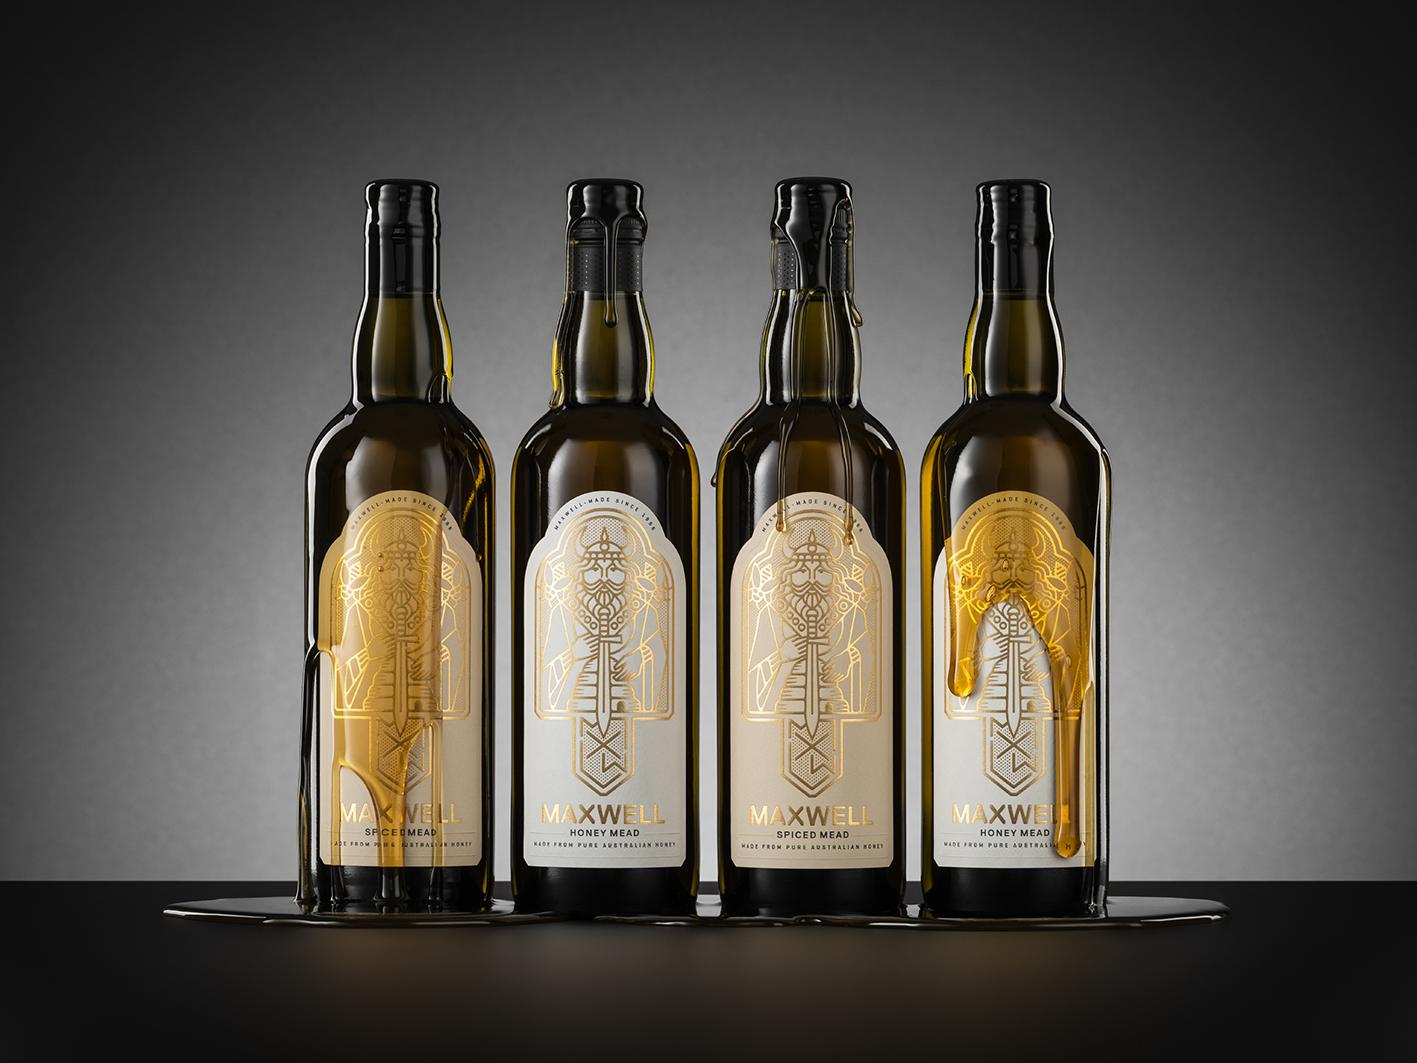 Australia's Oldest Honey Wine is Rejuvenated